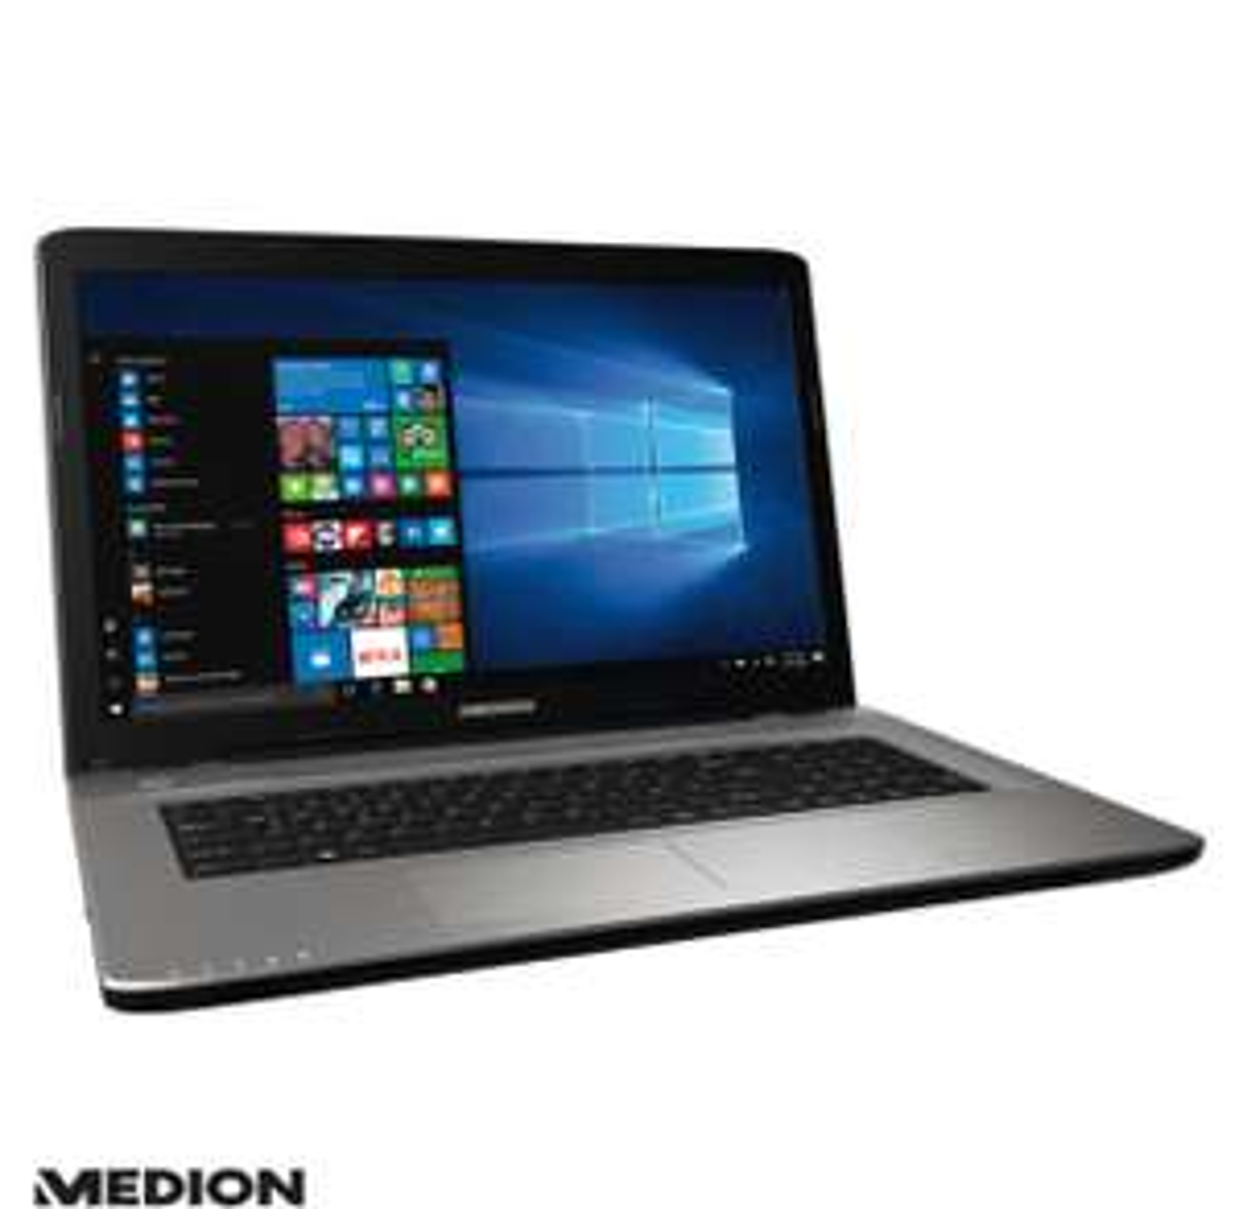 "Medion Laptop 17.3"" (128GB SSD / 1 TB )"